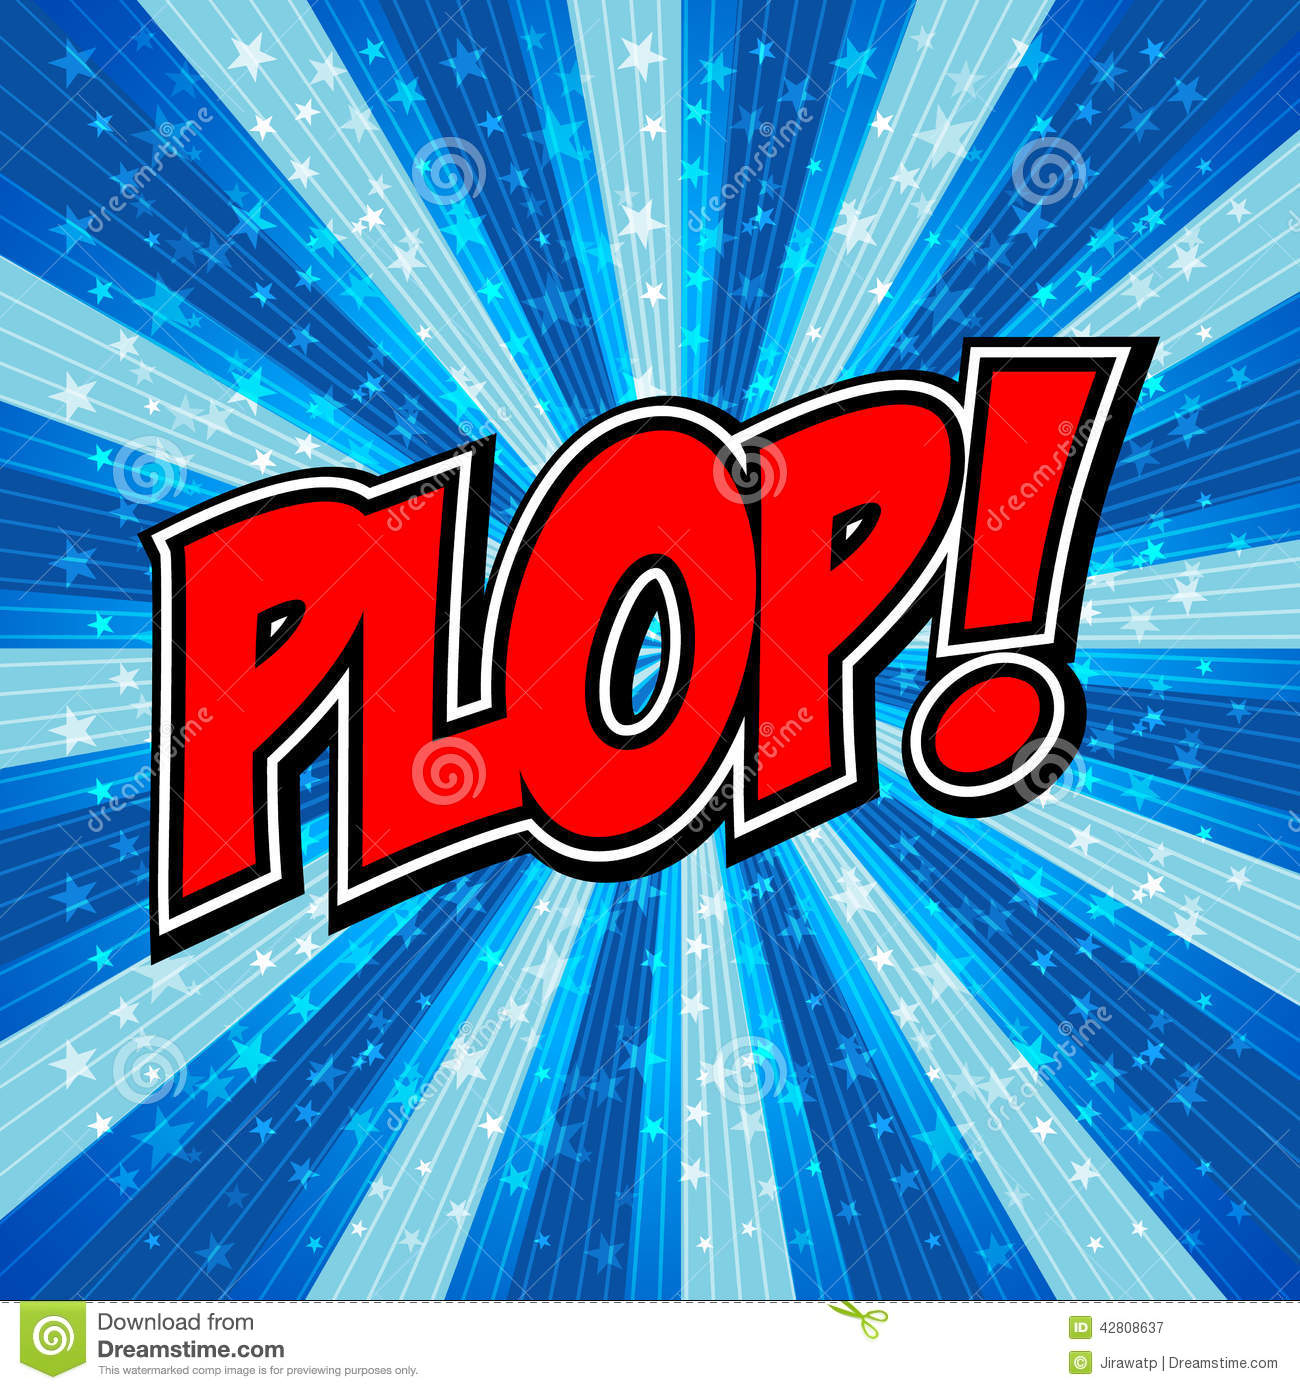 Plop! Comic Expression Vector Text. Stock Vector.